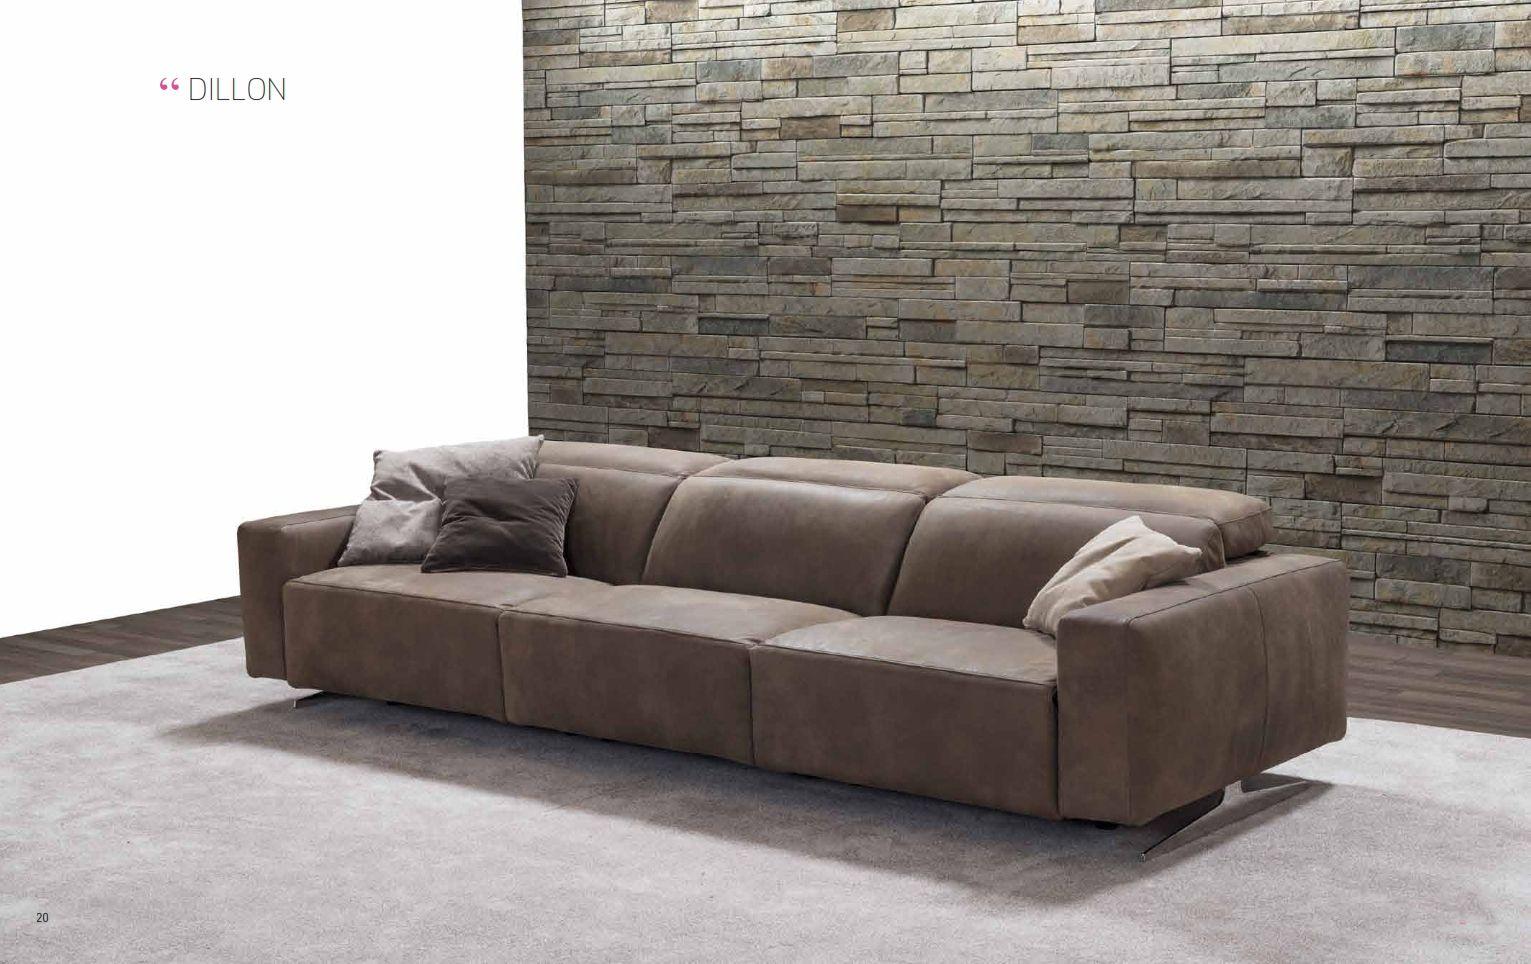 polsterm bel alpa salotti sofa serie dillondie m bel aus. Black Bedroom Furniture Sets. Home Design Ideas